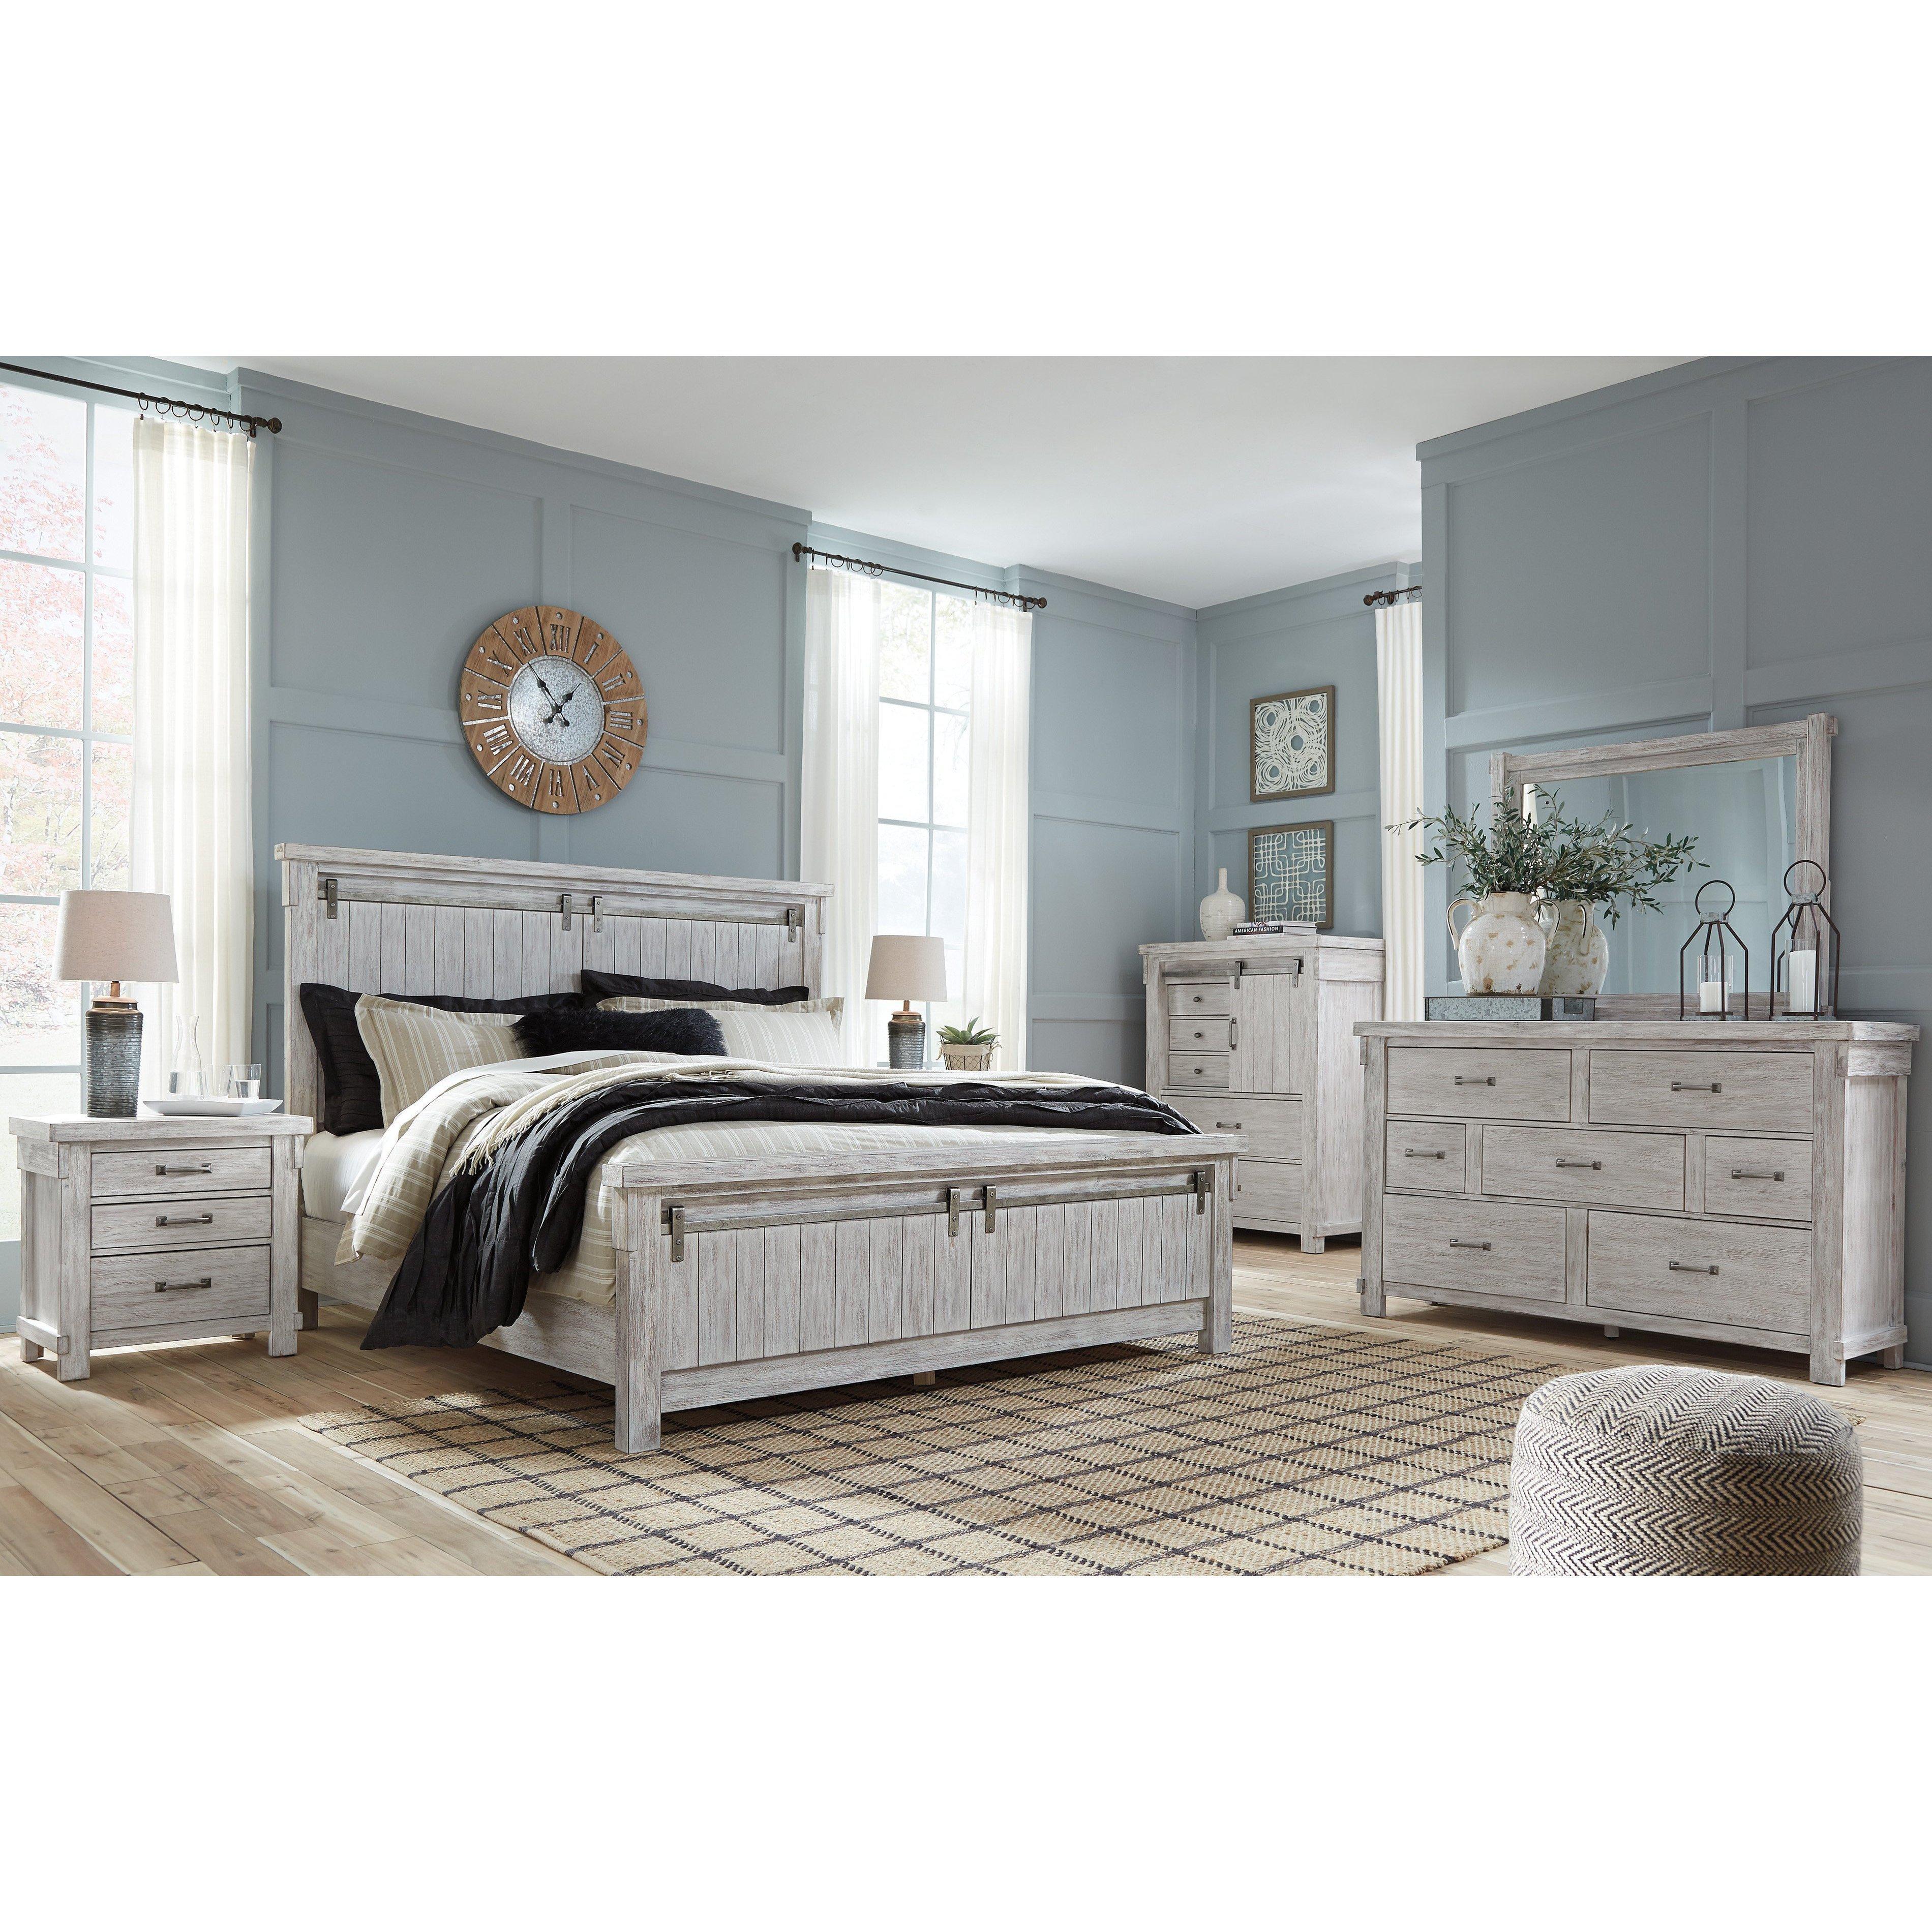 Bedroom Set with Mattress Included Unique Brashland Whitewash Bedroom Set